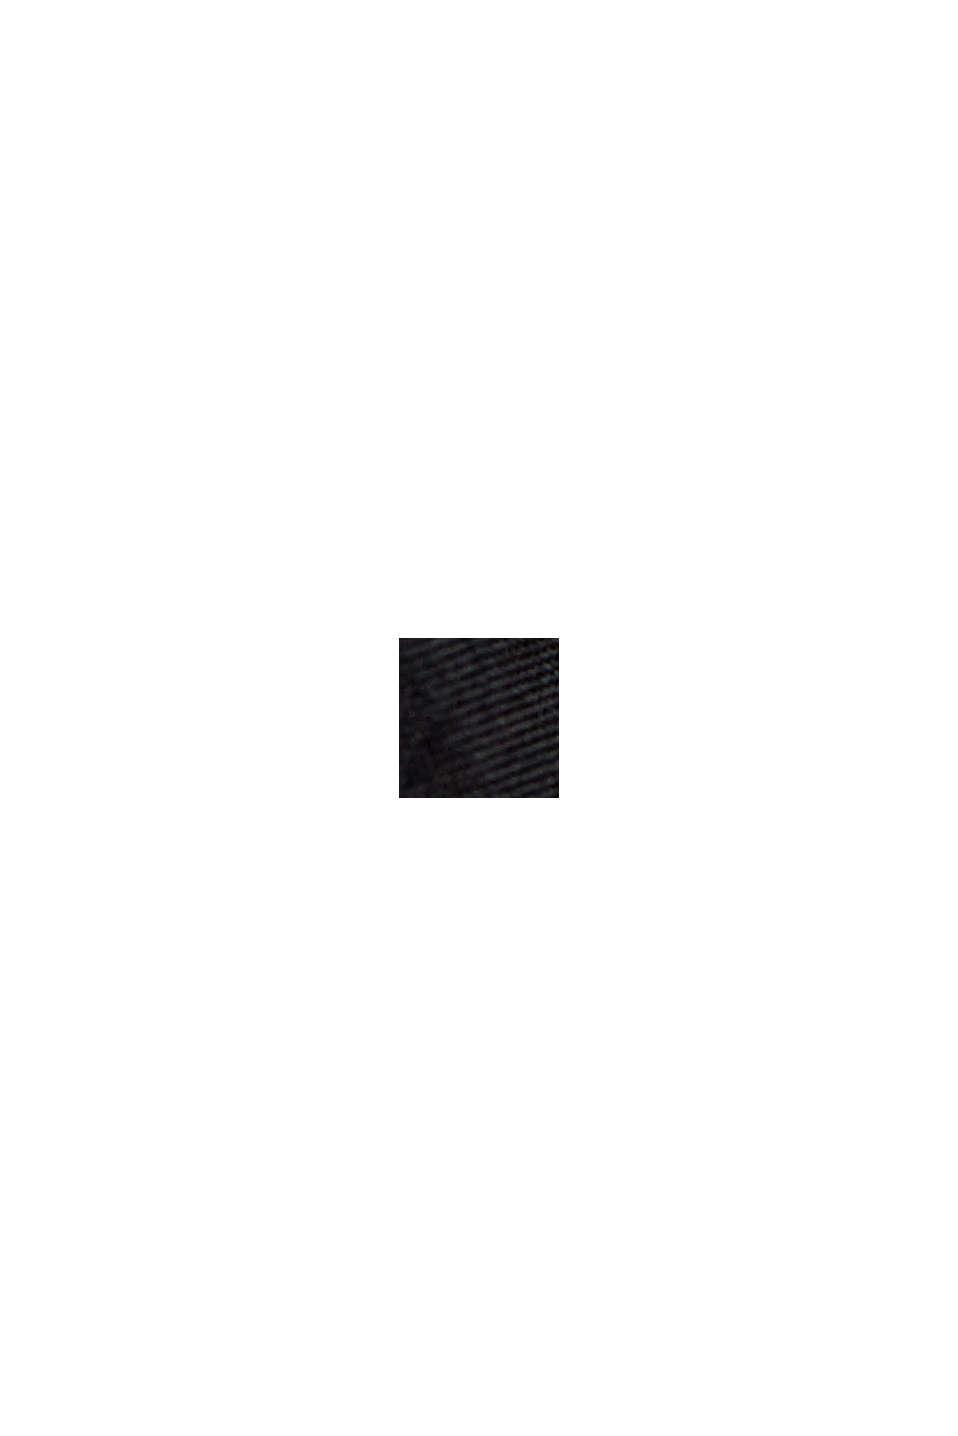 #ReimagineFlexibility Giacca trapuntata 2 in 1 con imbottitura in lana, BLACK, swatch